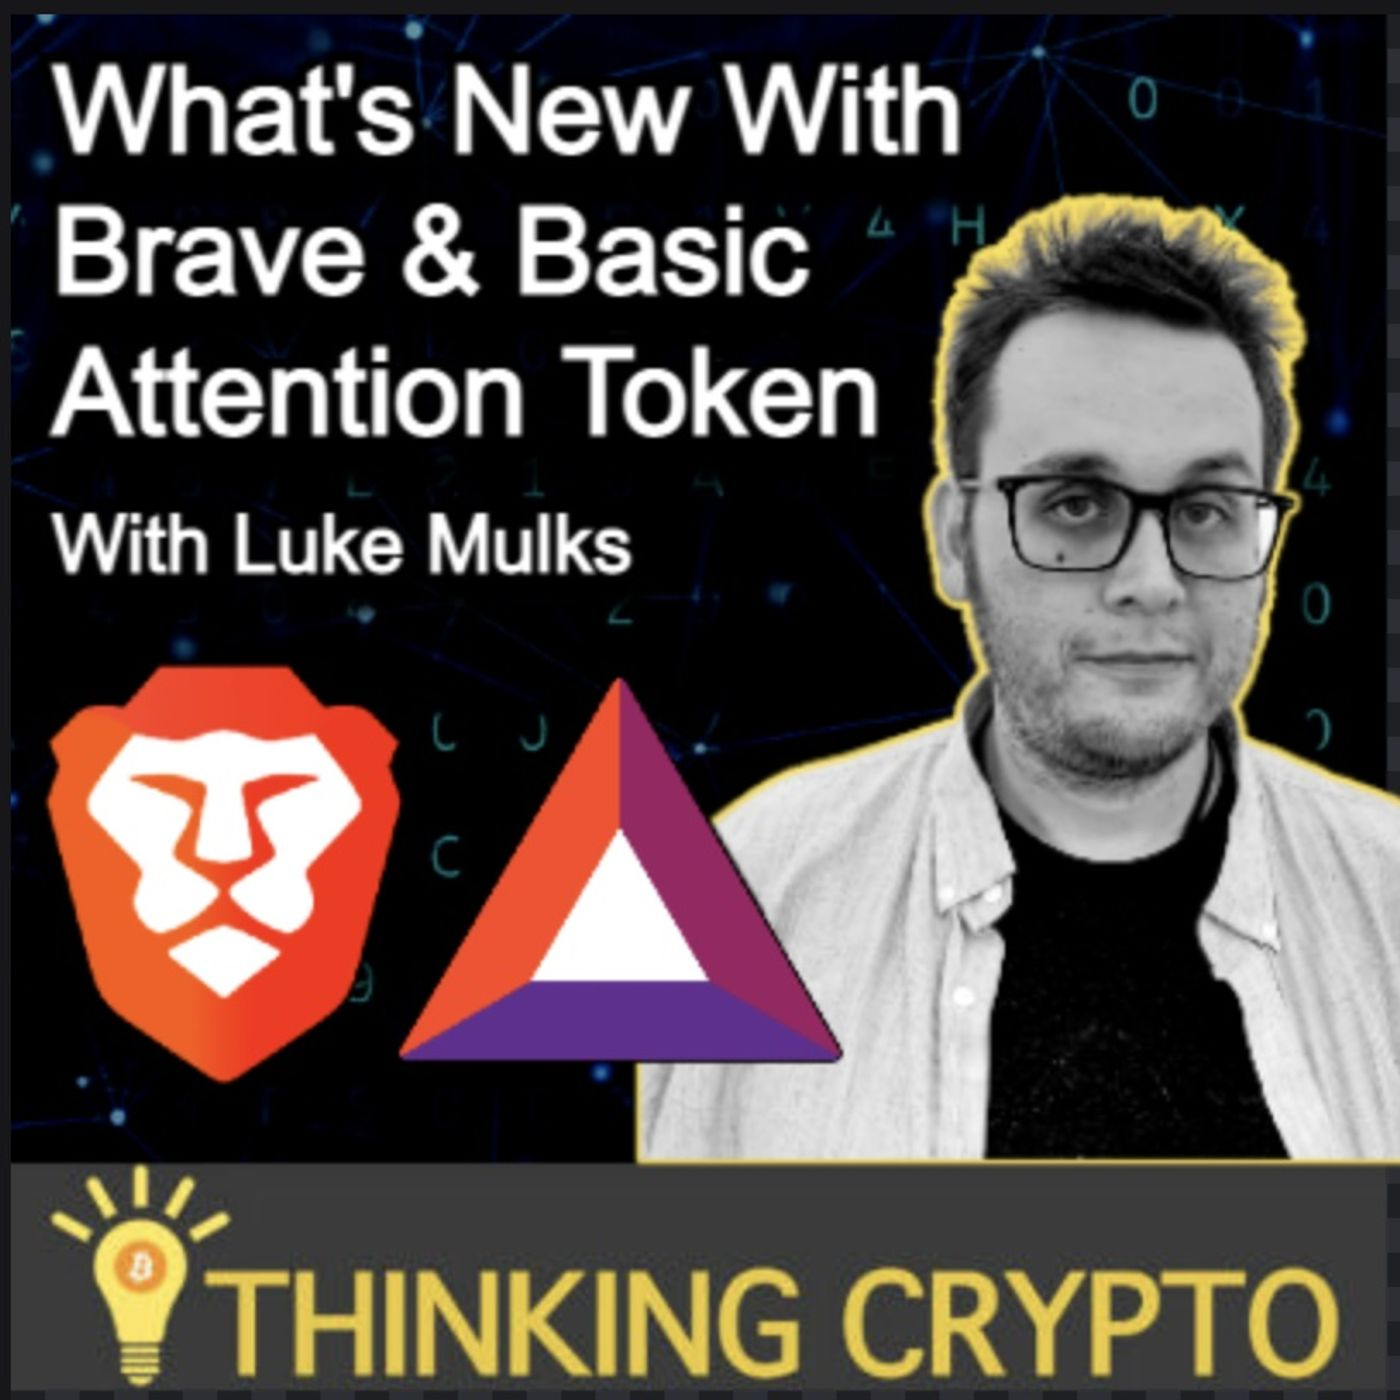 Luke Mulks Interview - Brave & Basic Attention Token (BAT) - Brave Talk & Search, Crypto Market